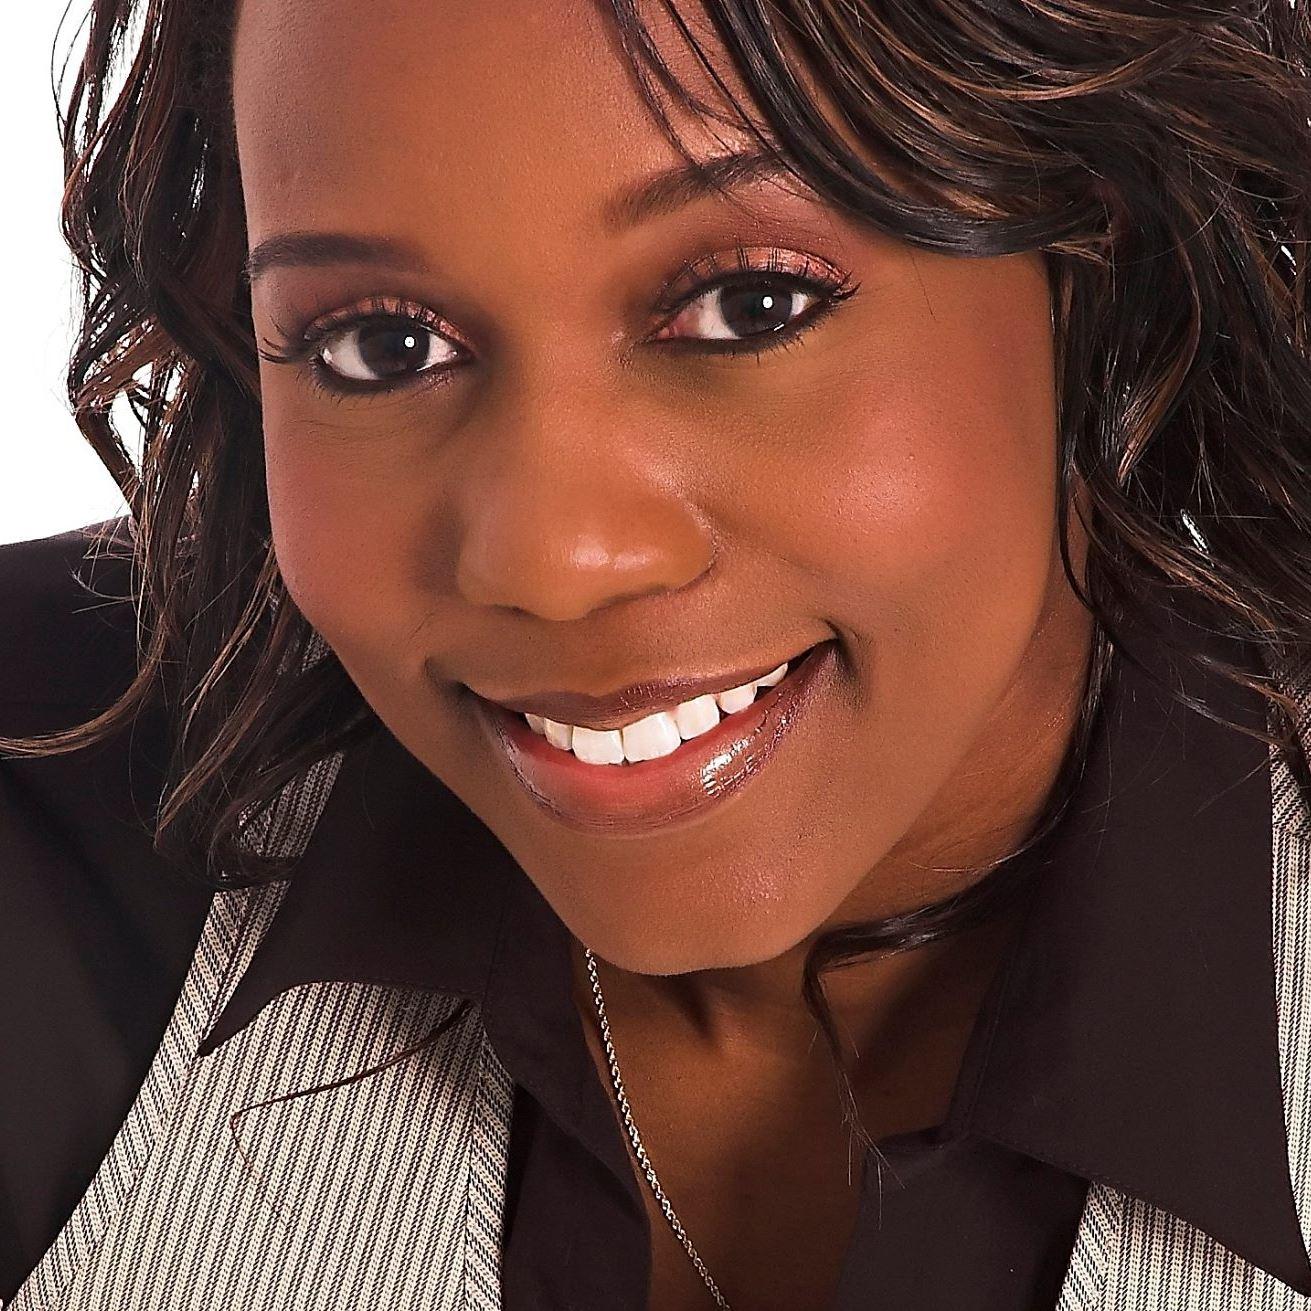 Charisse Callender-Scott - Realtor, Community Leader, MCPS Mom